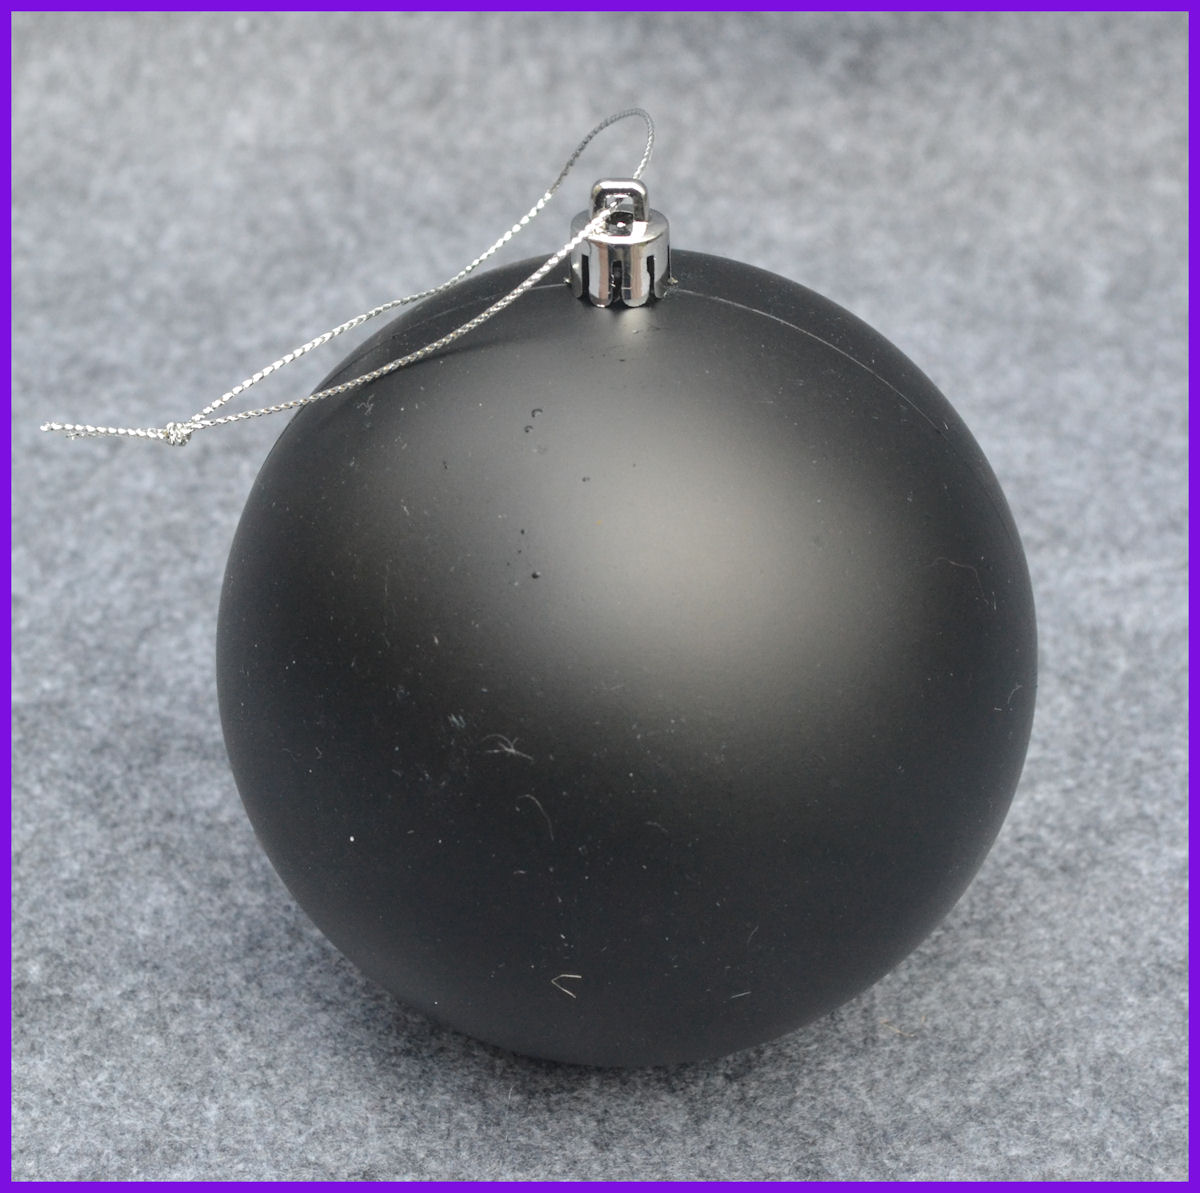 da-round-ball-4-5-inches-890205749-sm.jpg